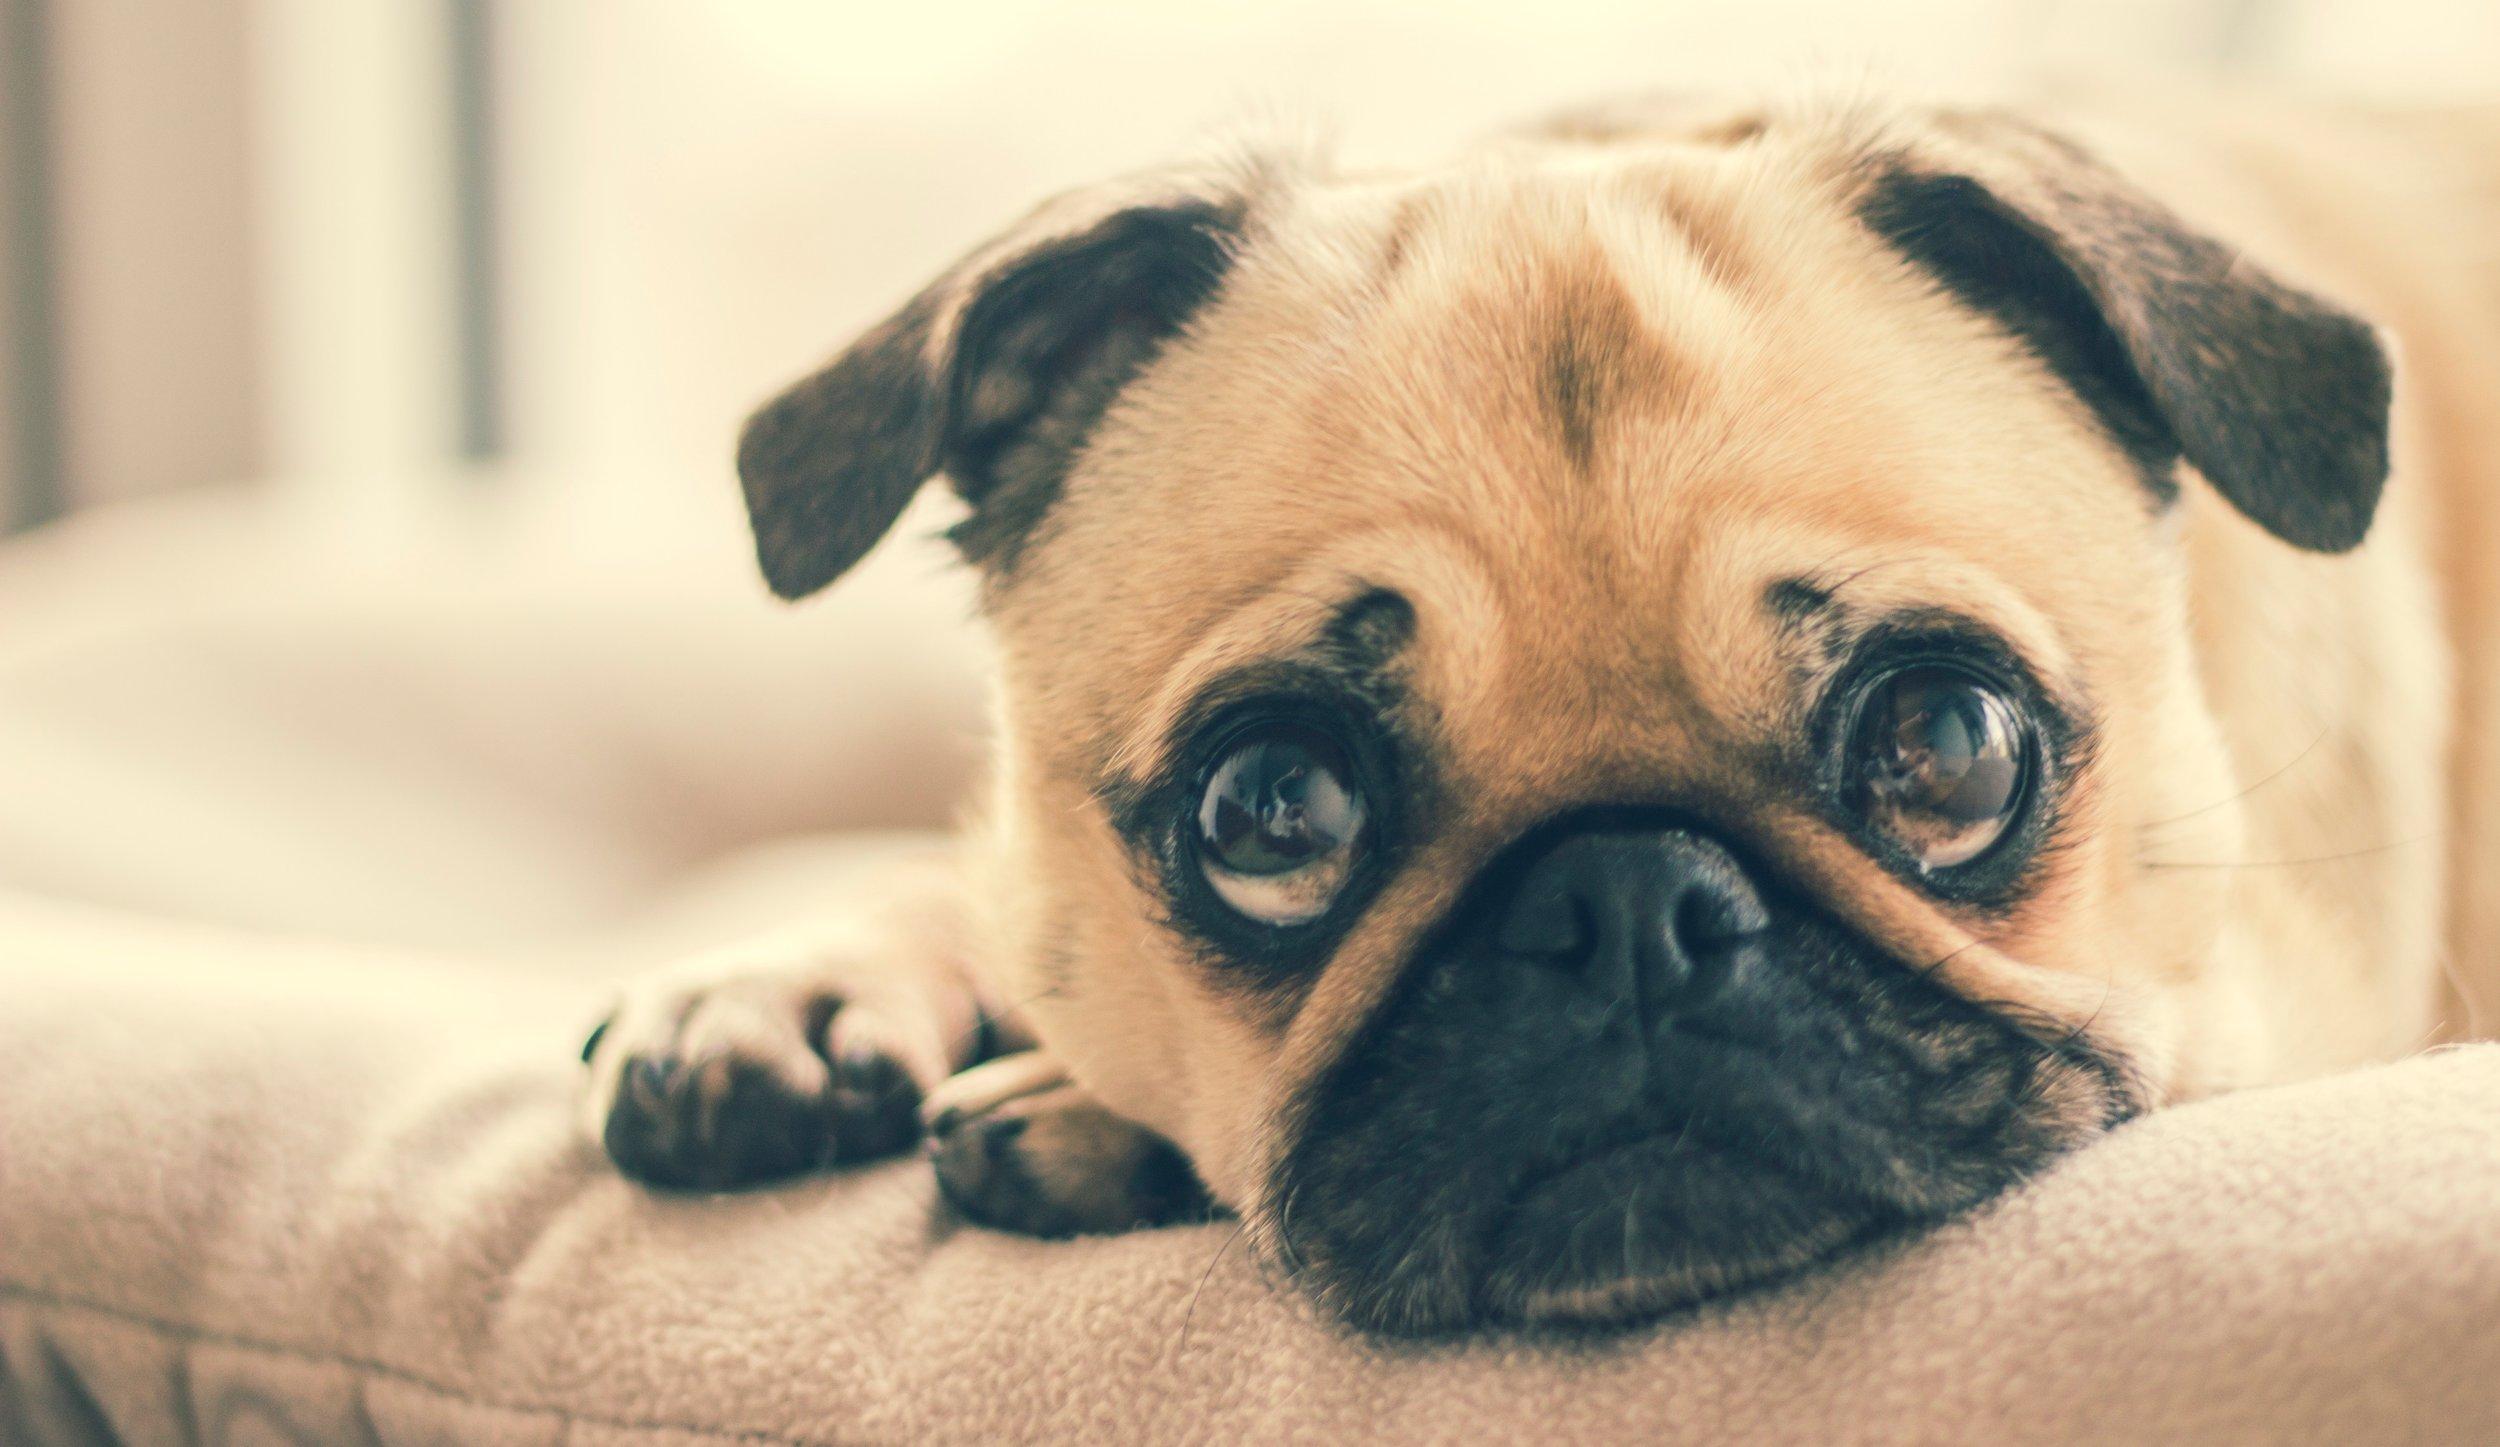 adorable-animal-breed-374906.jpg